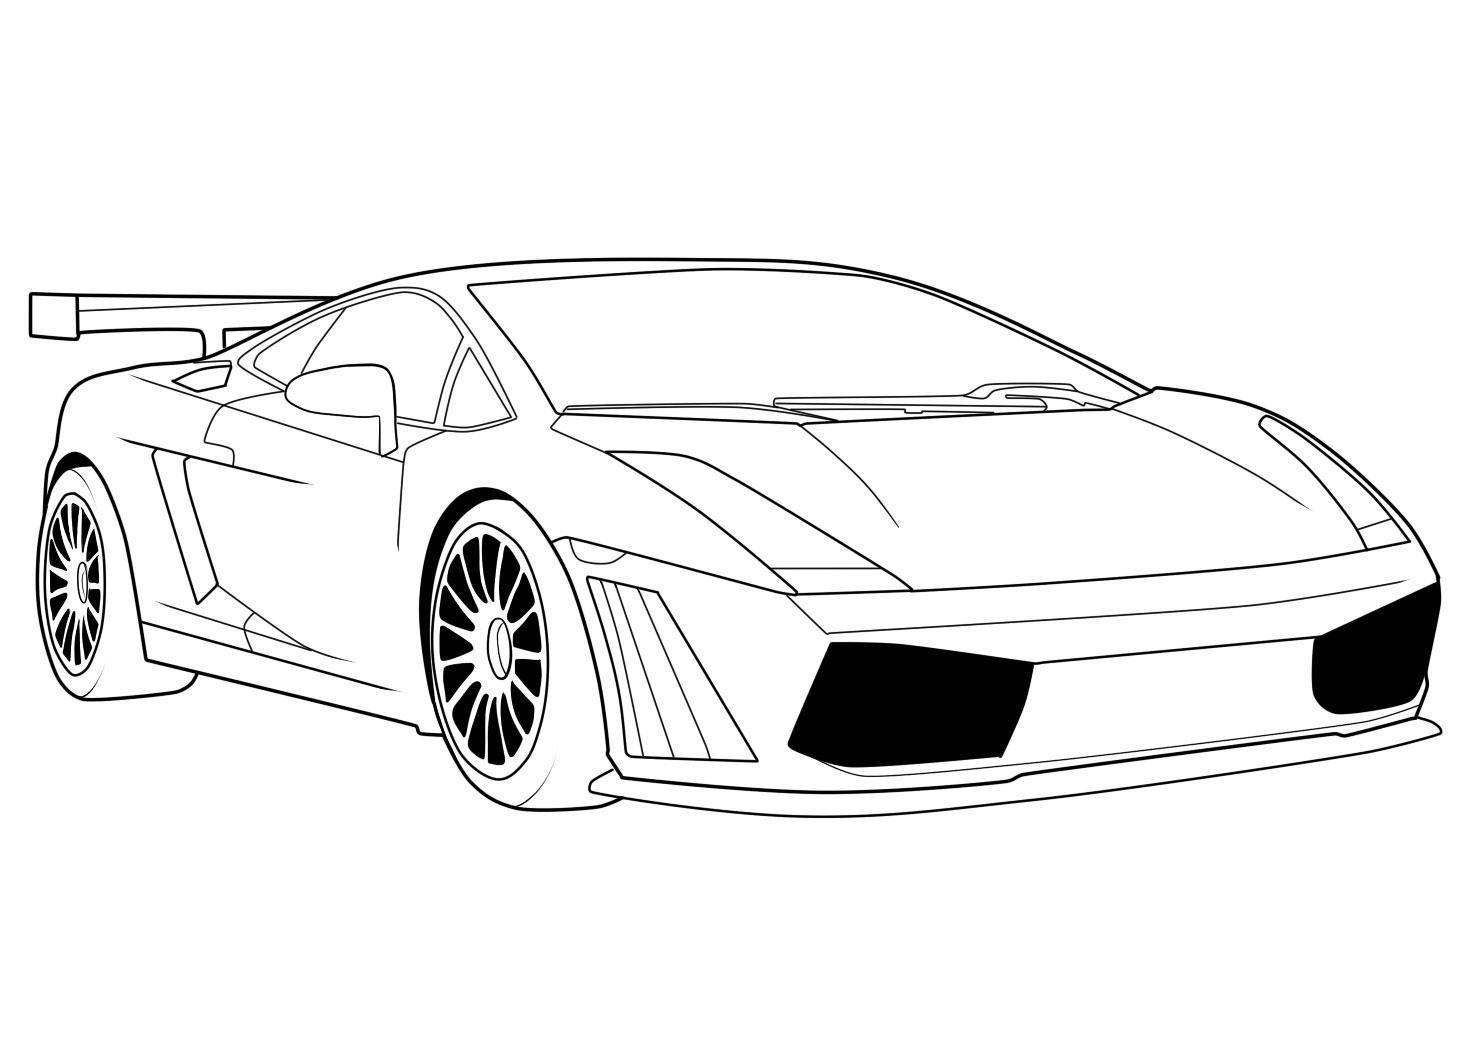 42 Coloring Page Lamborghini Race Car Coloring Pages Best Lamborghini Cars Coloring Pages